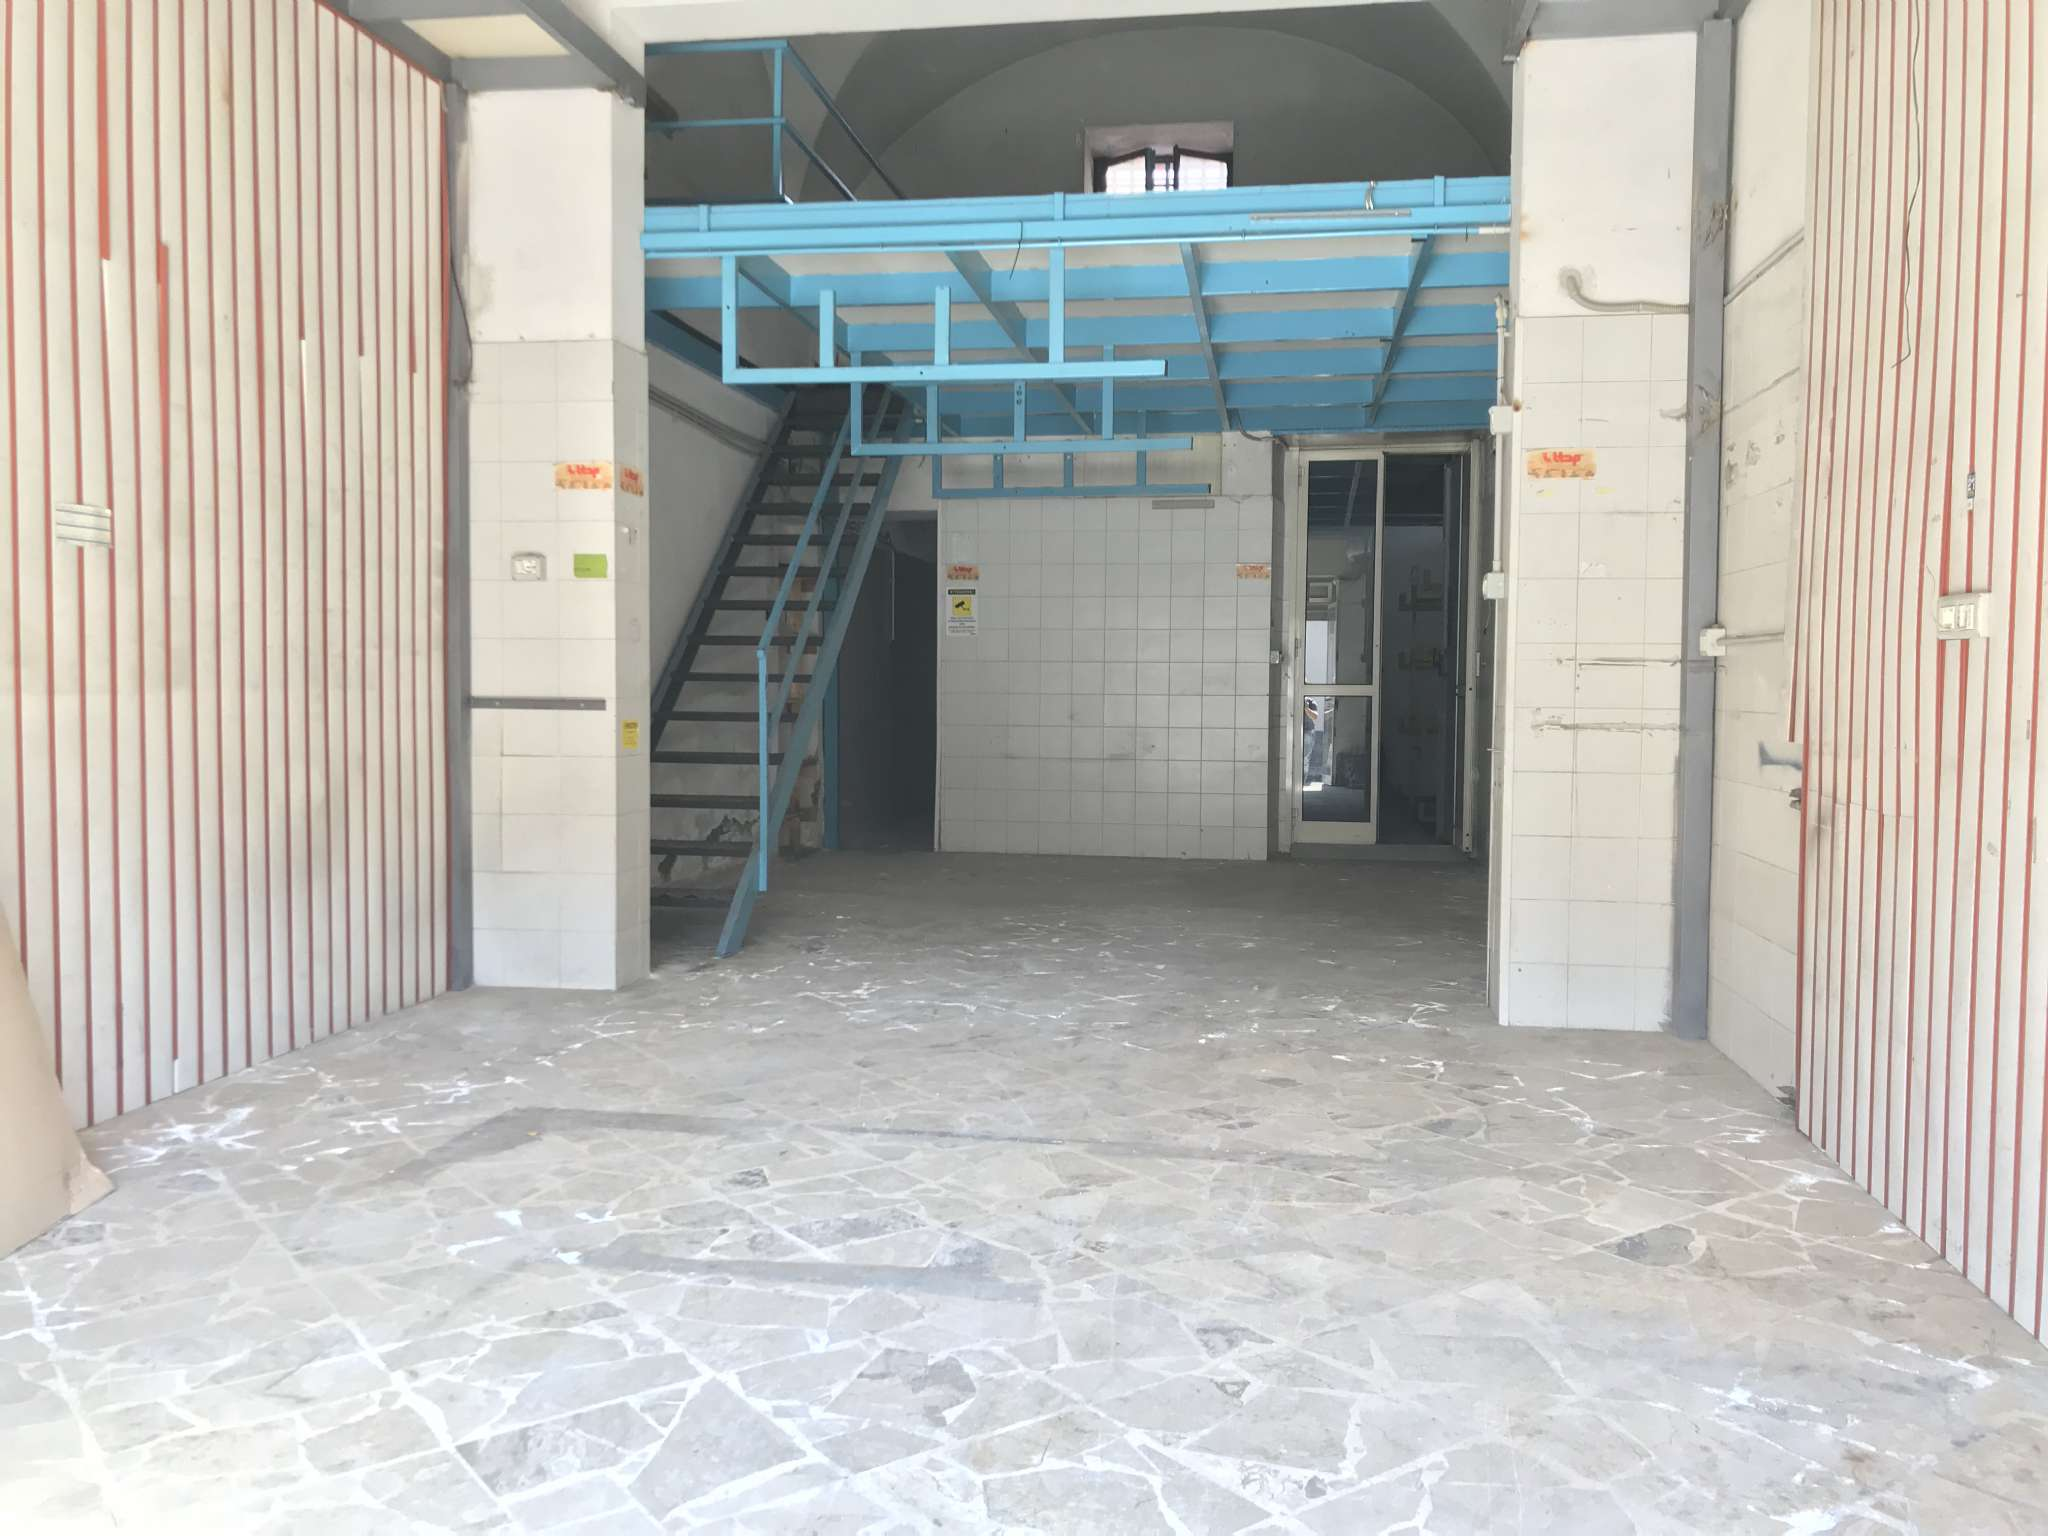 Affitto Bottega 44 mq con soppalco e servizio Rif. 8177029